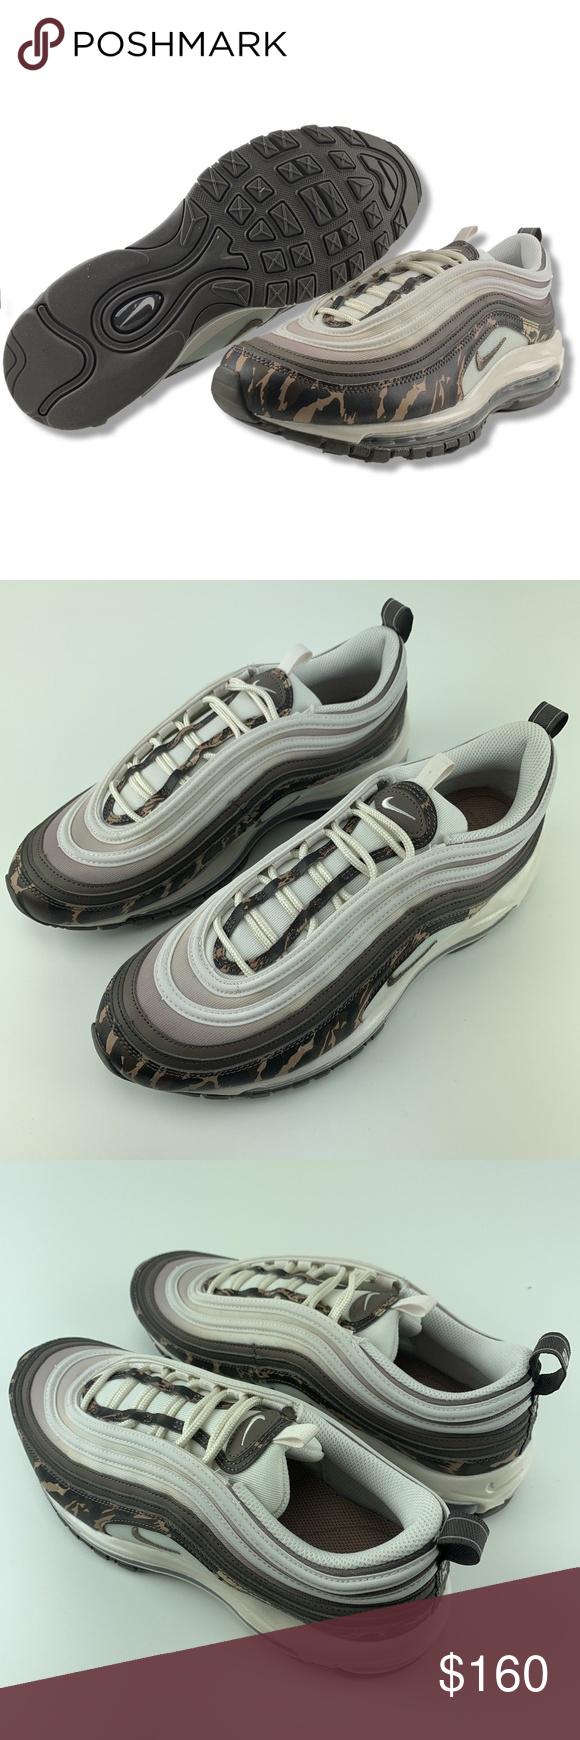 huge selection of eb193 d071e Nike Air Max 97 Ridgerock Mink Brown Desert Nike Air Max 97 Size 10.5  Womens Ridgerock Mink Brown Desert Dust Mens Size 9 (Conversion) Brand New  Shoes, ...